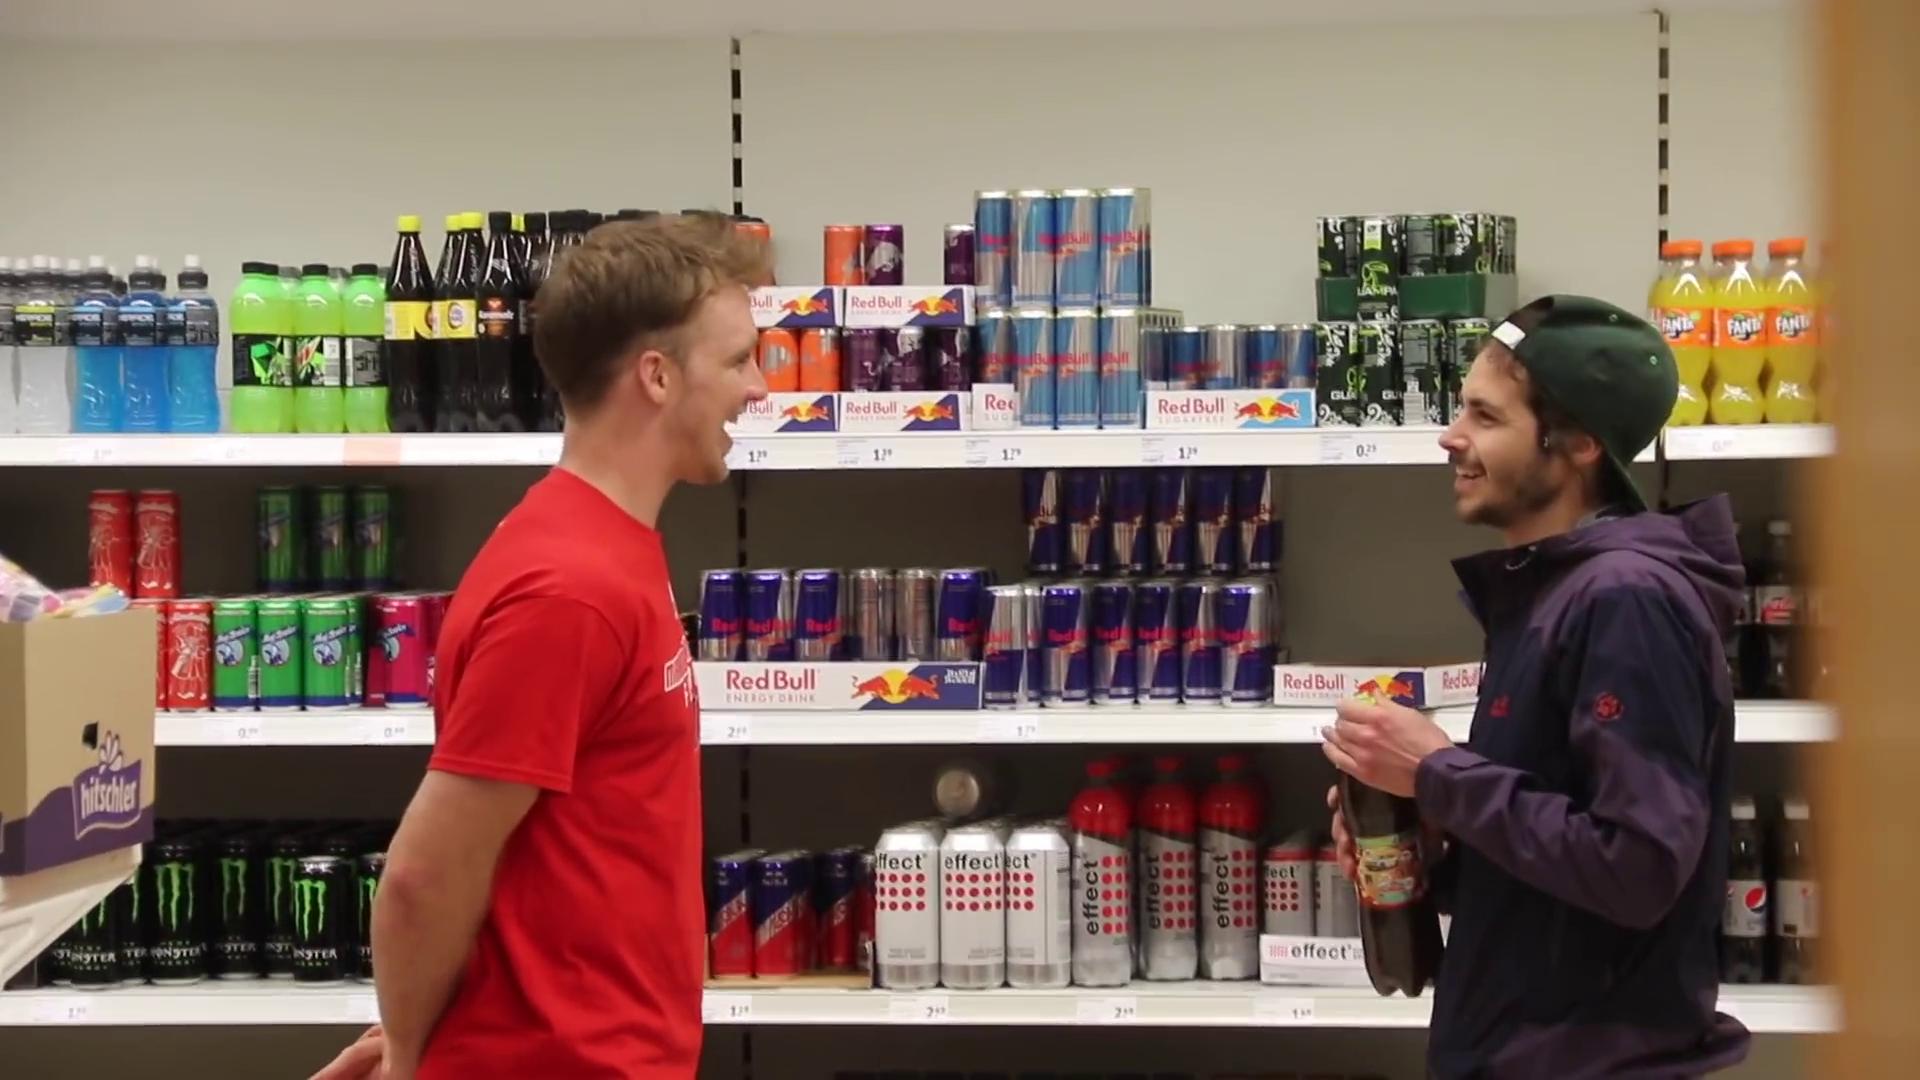 American tries to speak German at the grocery store